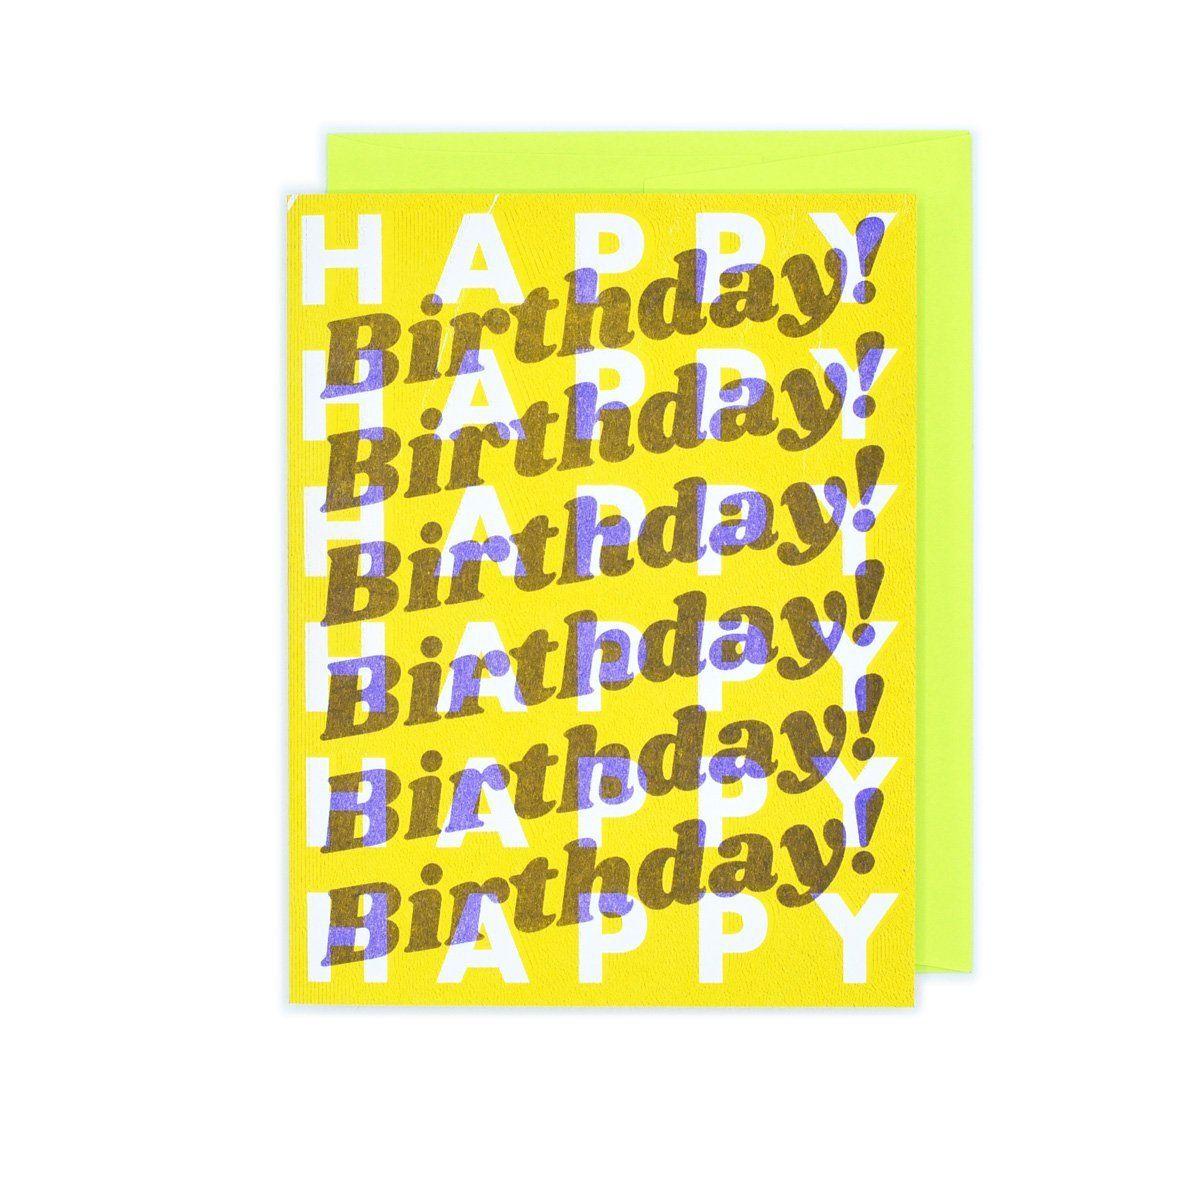 Retro Repeats Risograph Birthday Card In 2021 Birthday Cards Happy Birthday Cards Happy Birthday Cards Handmade